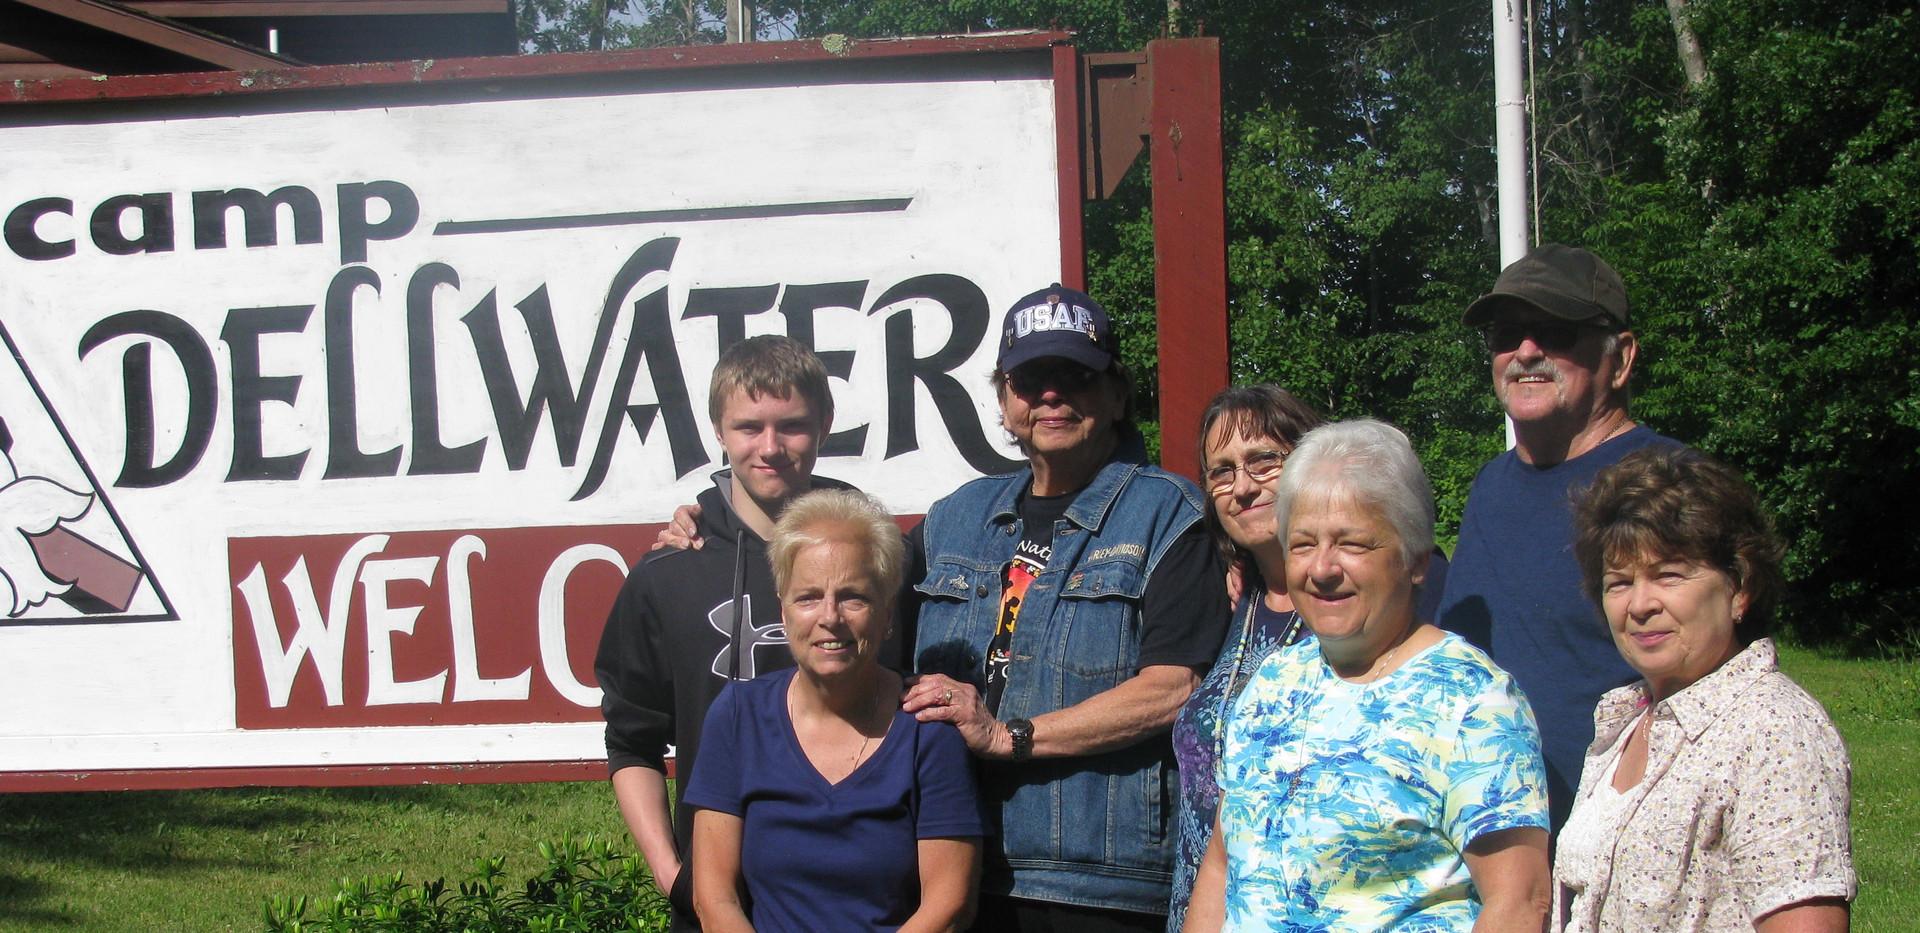 Camp Dellwater mission